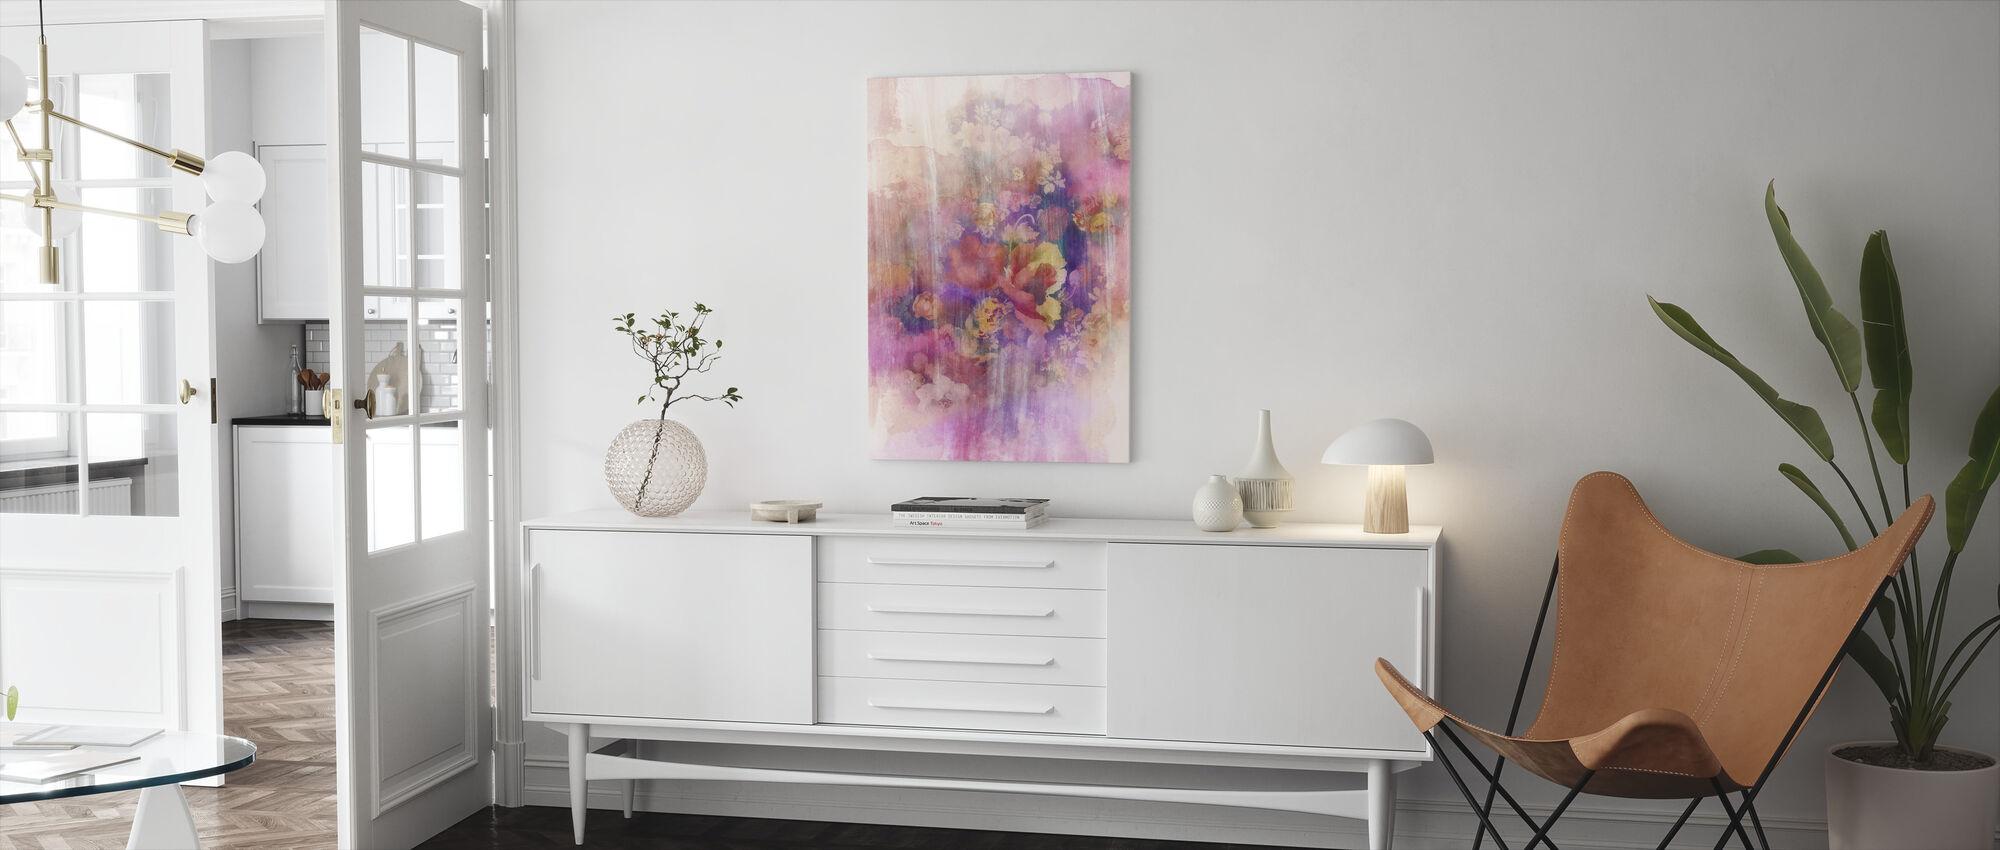 Smokey Floral April - Canvas print - Living Room